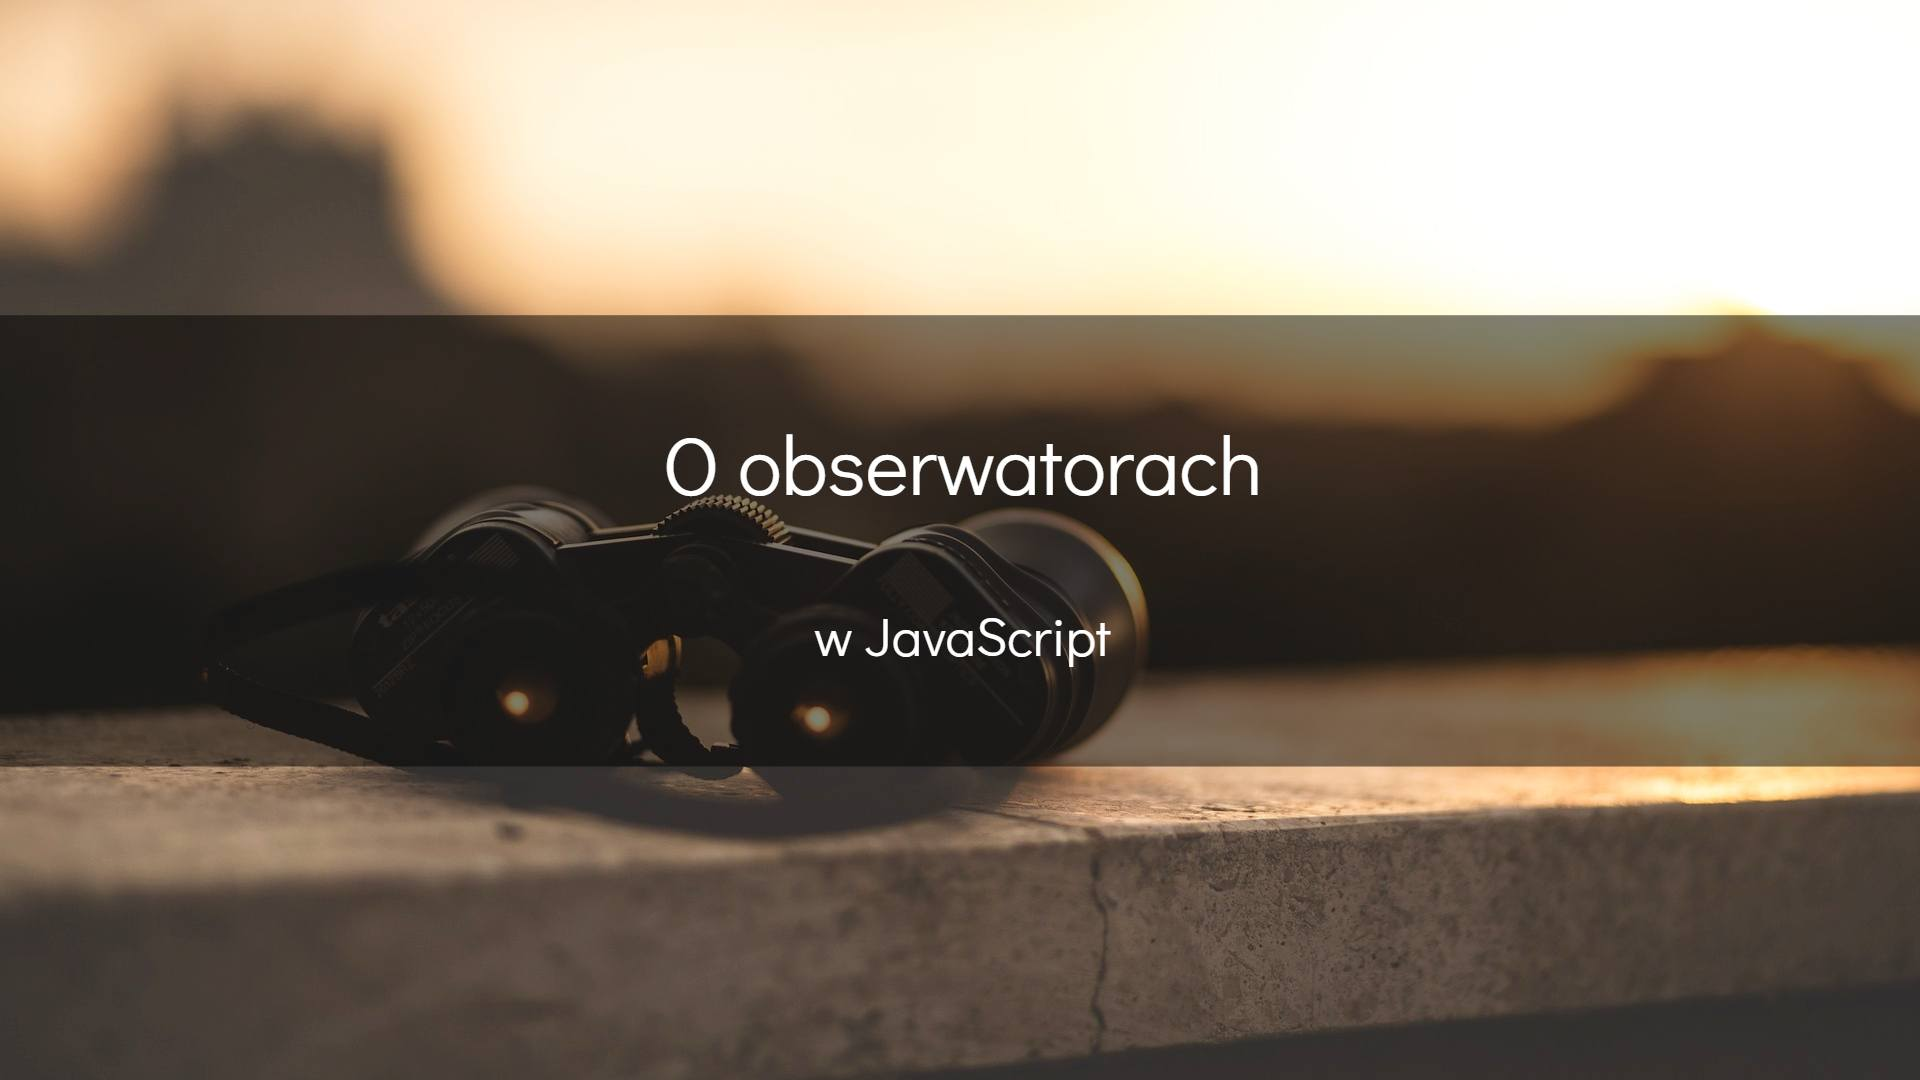 O obserwatorach w JavaScript